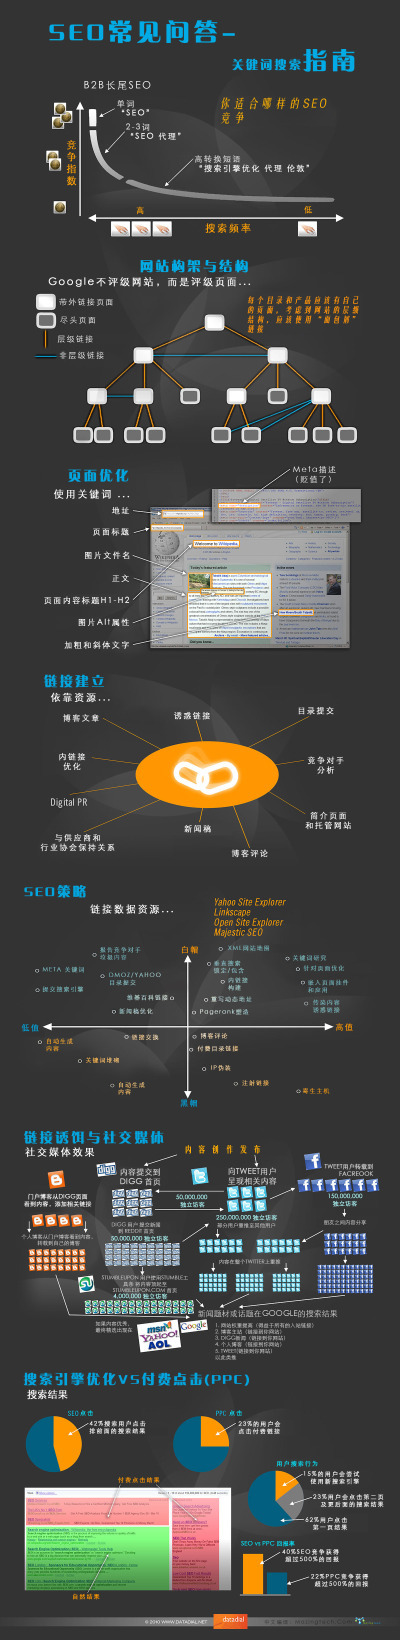 Visual+FAQ+of+SEO-cn.jpeg